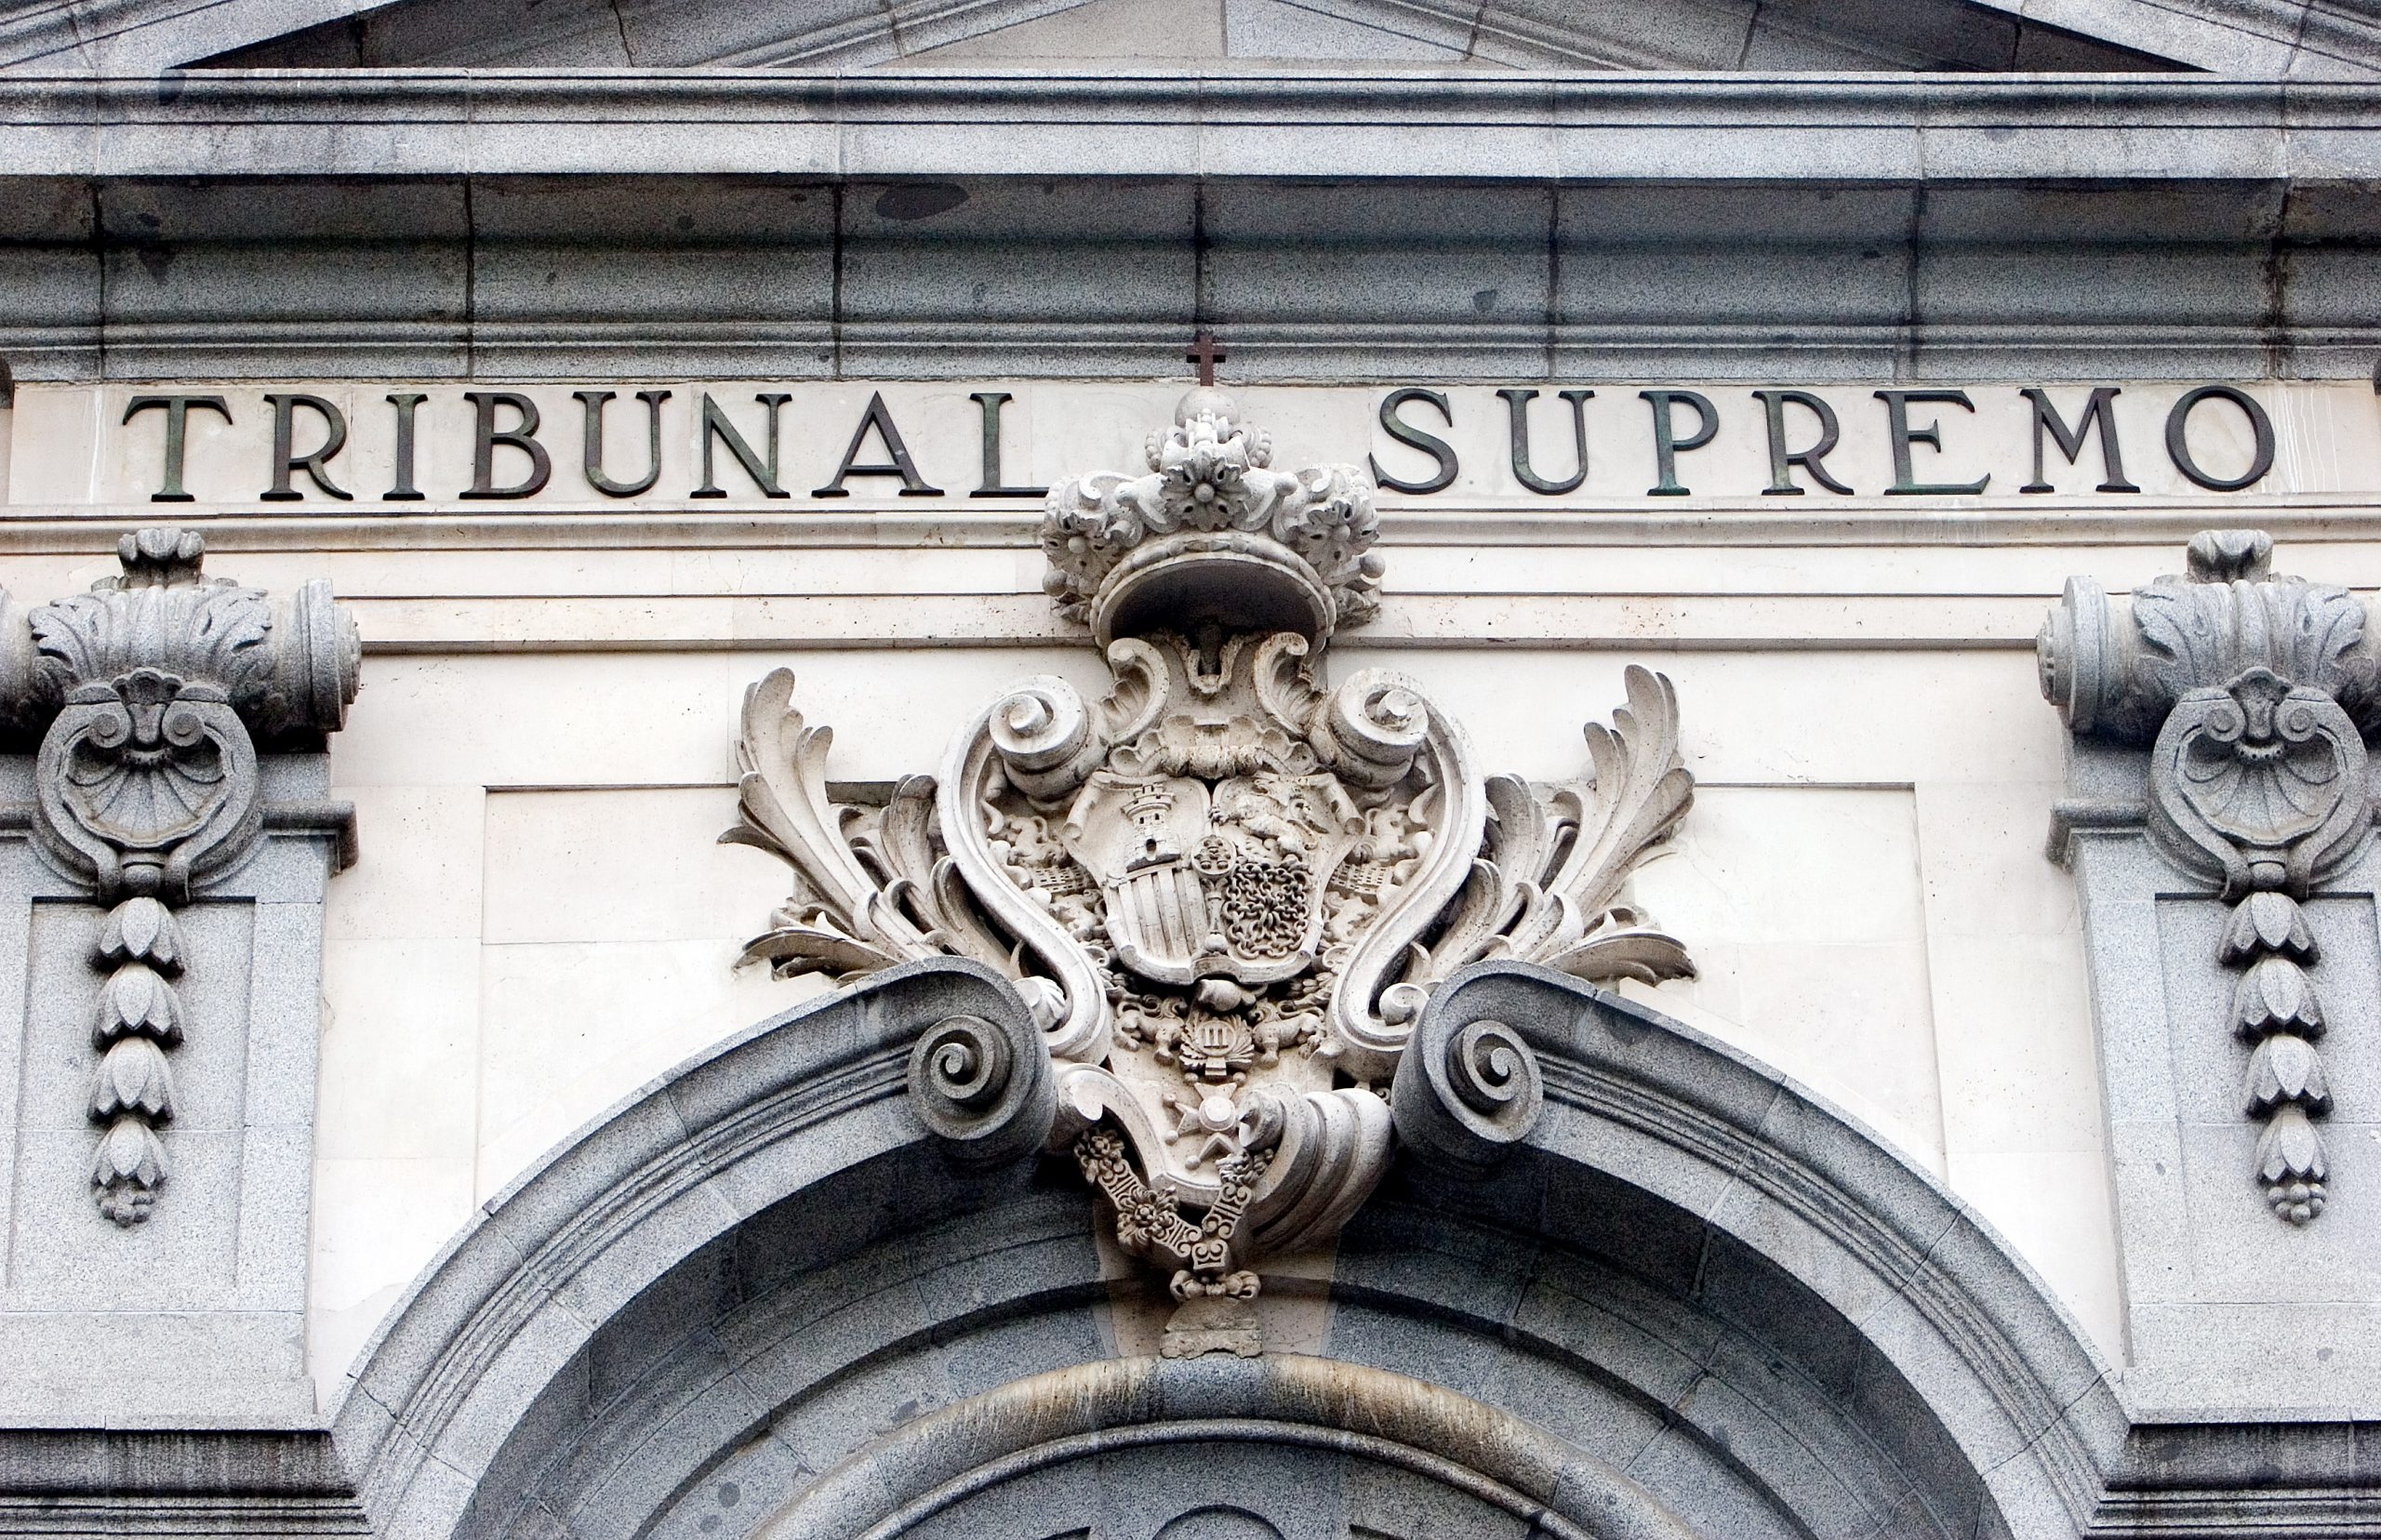 Tribunal Supremo. Madrid